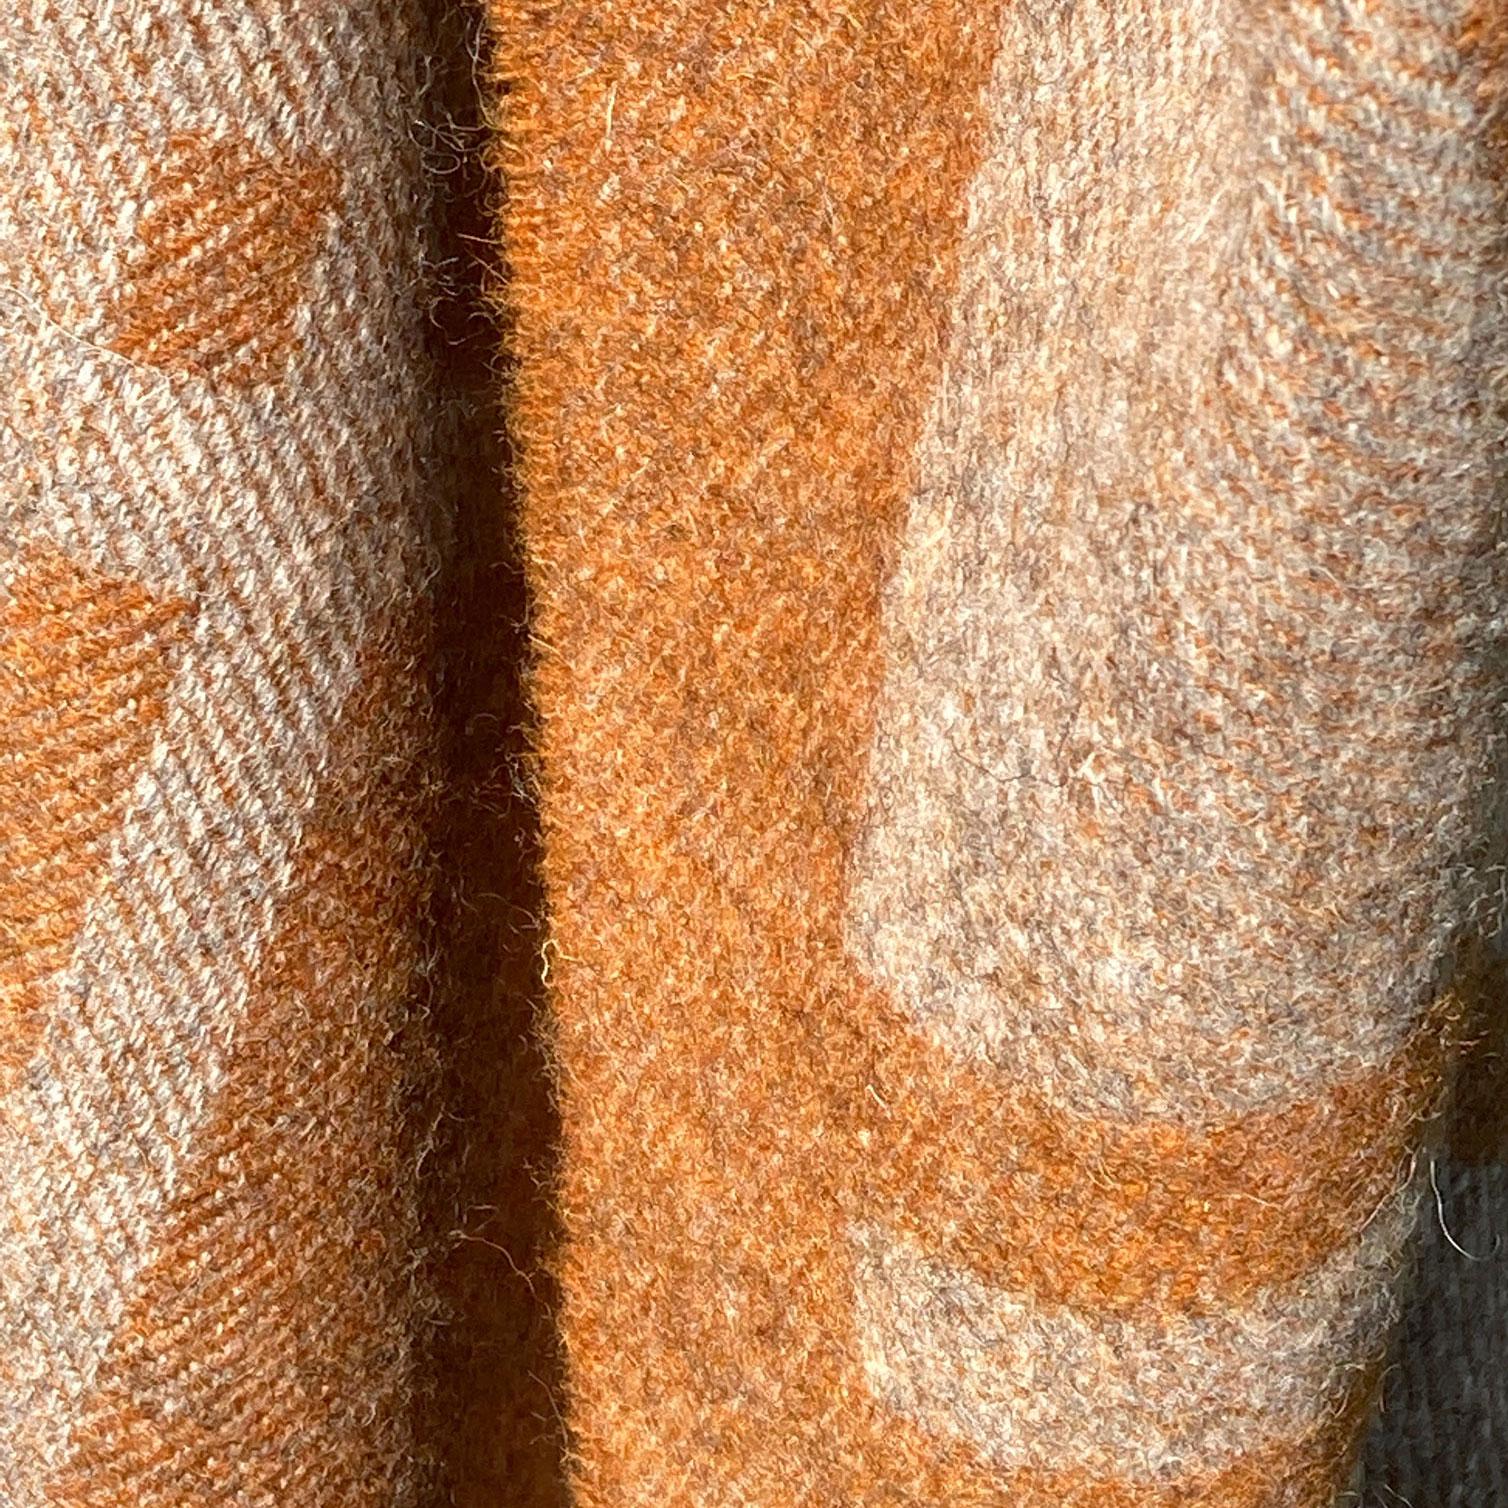 Laura's Loom, Cumbrian Summer, Blanket, Beech